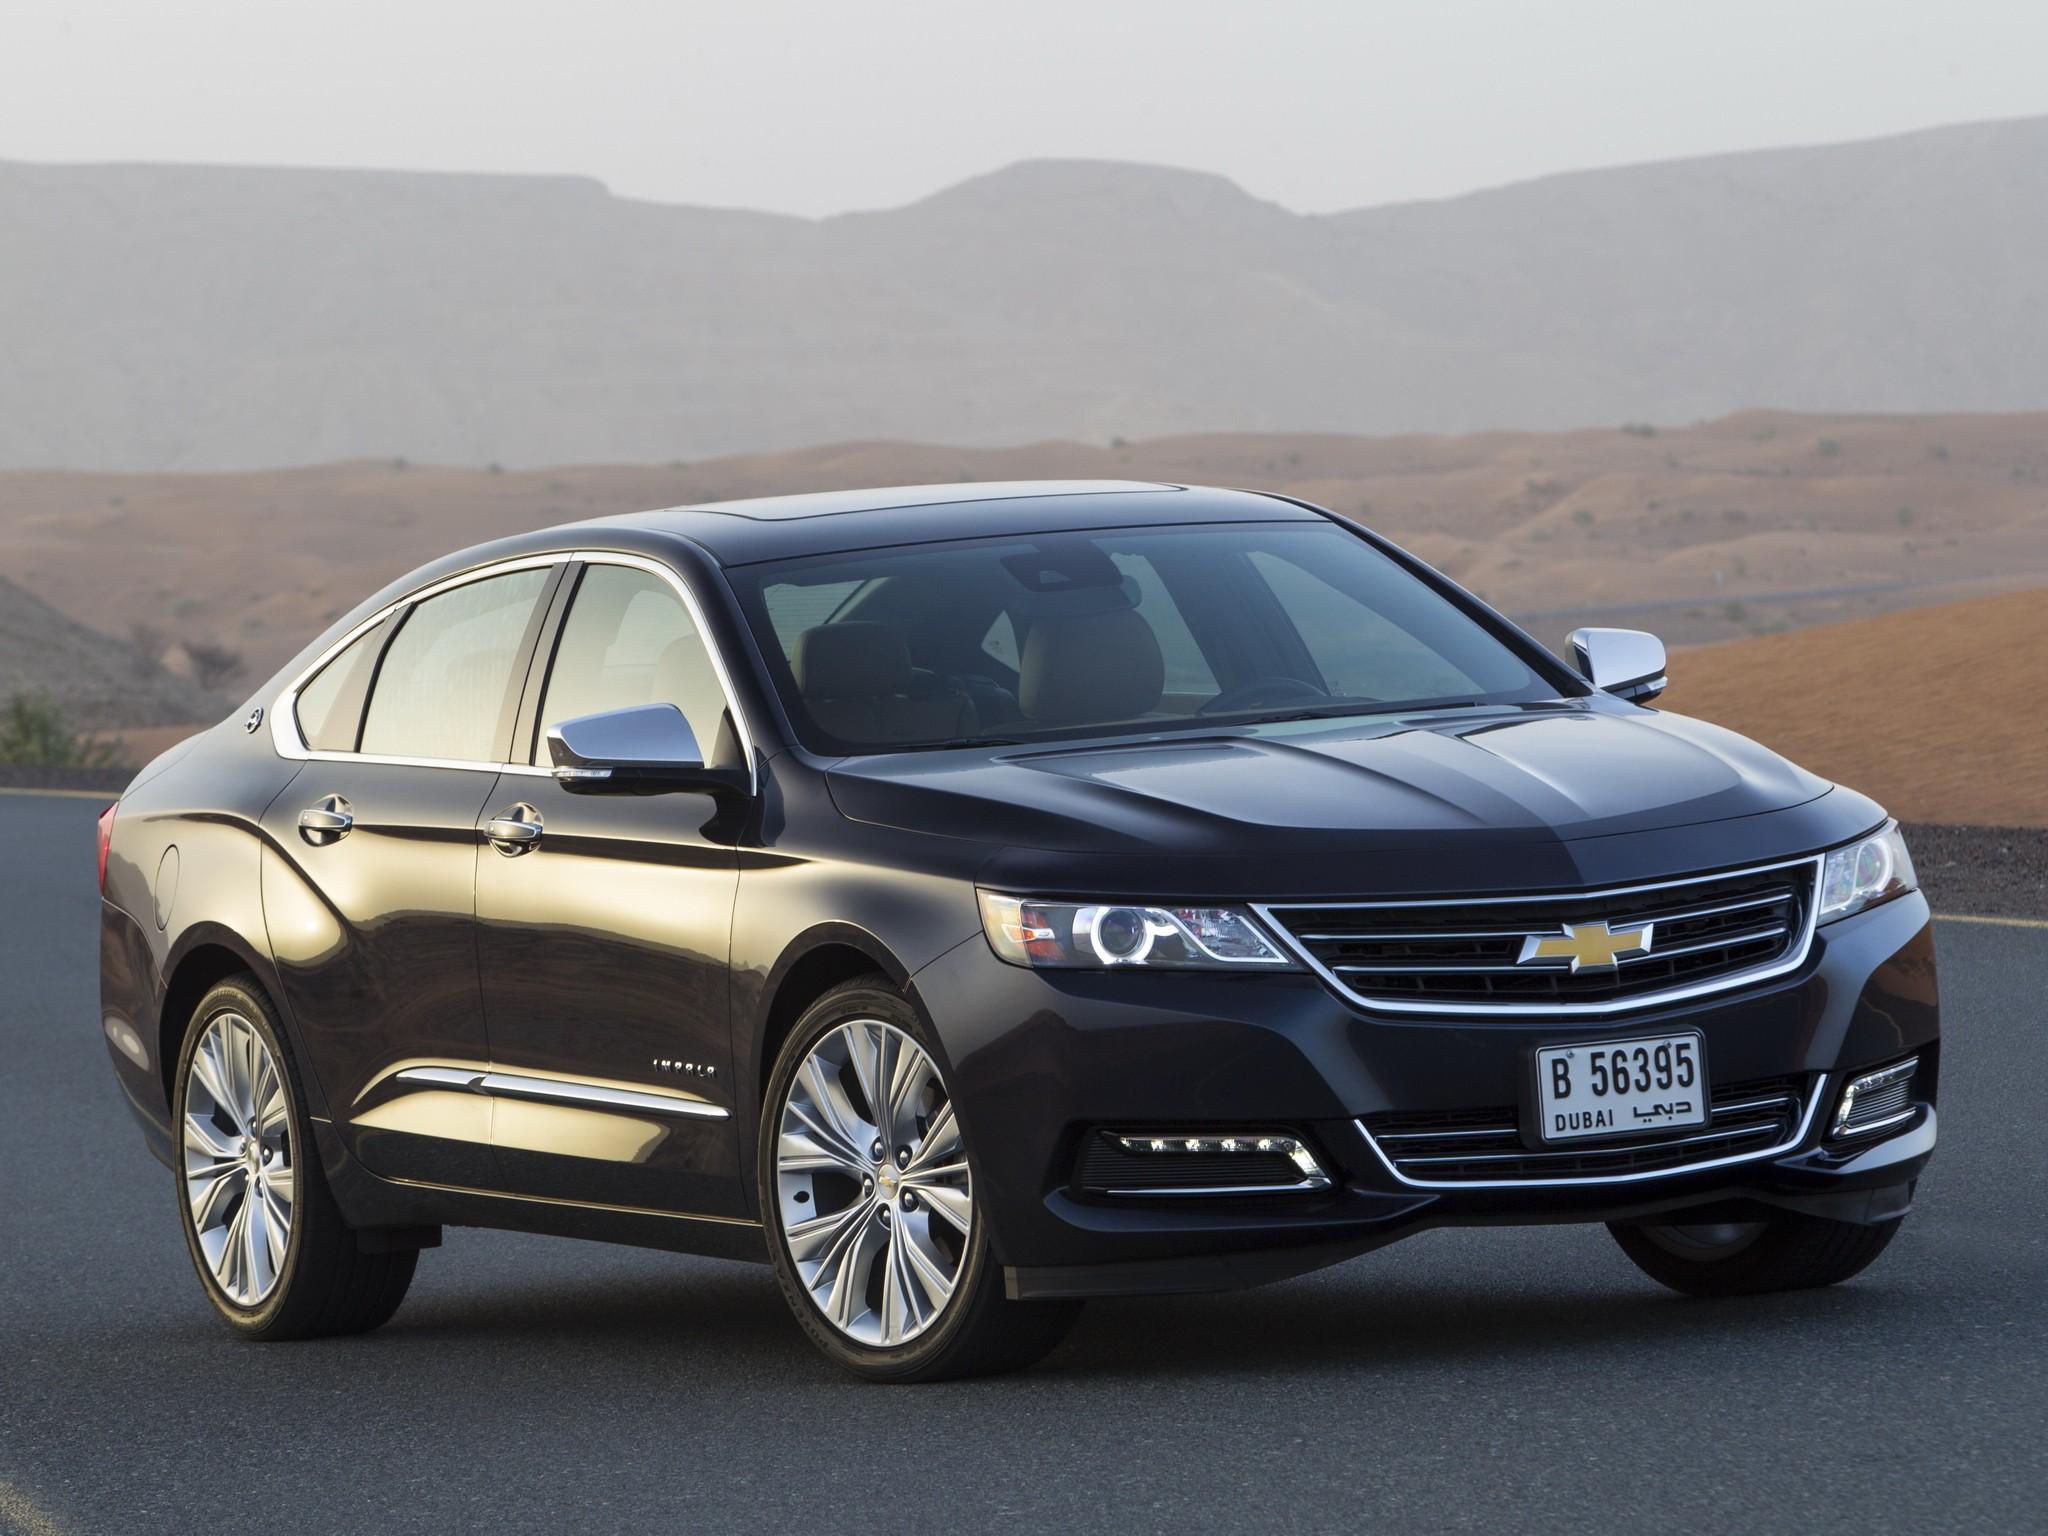 CHEVROLET Impala - 2013, 2014, 2015, 2016 - autoevolution